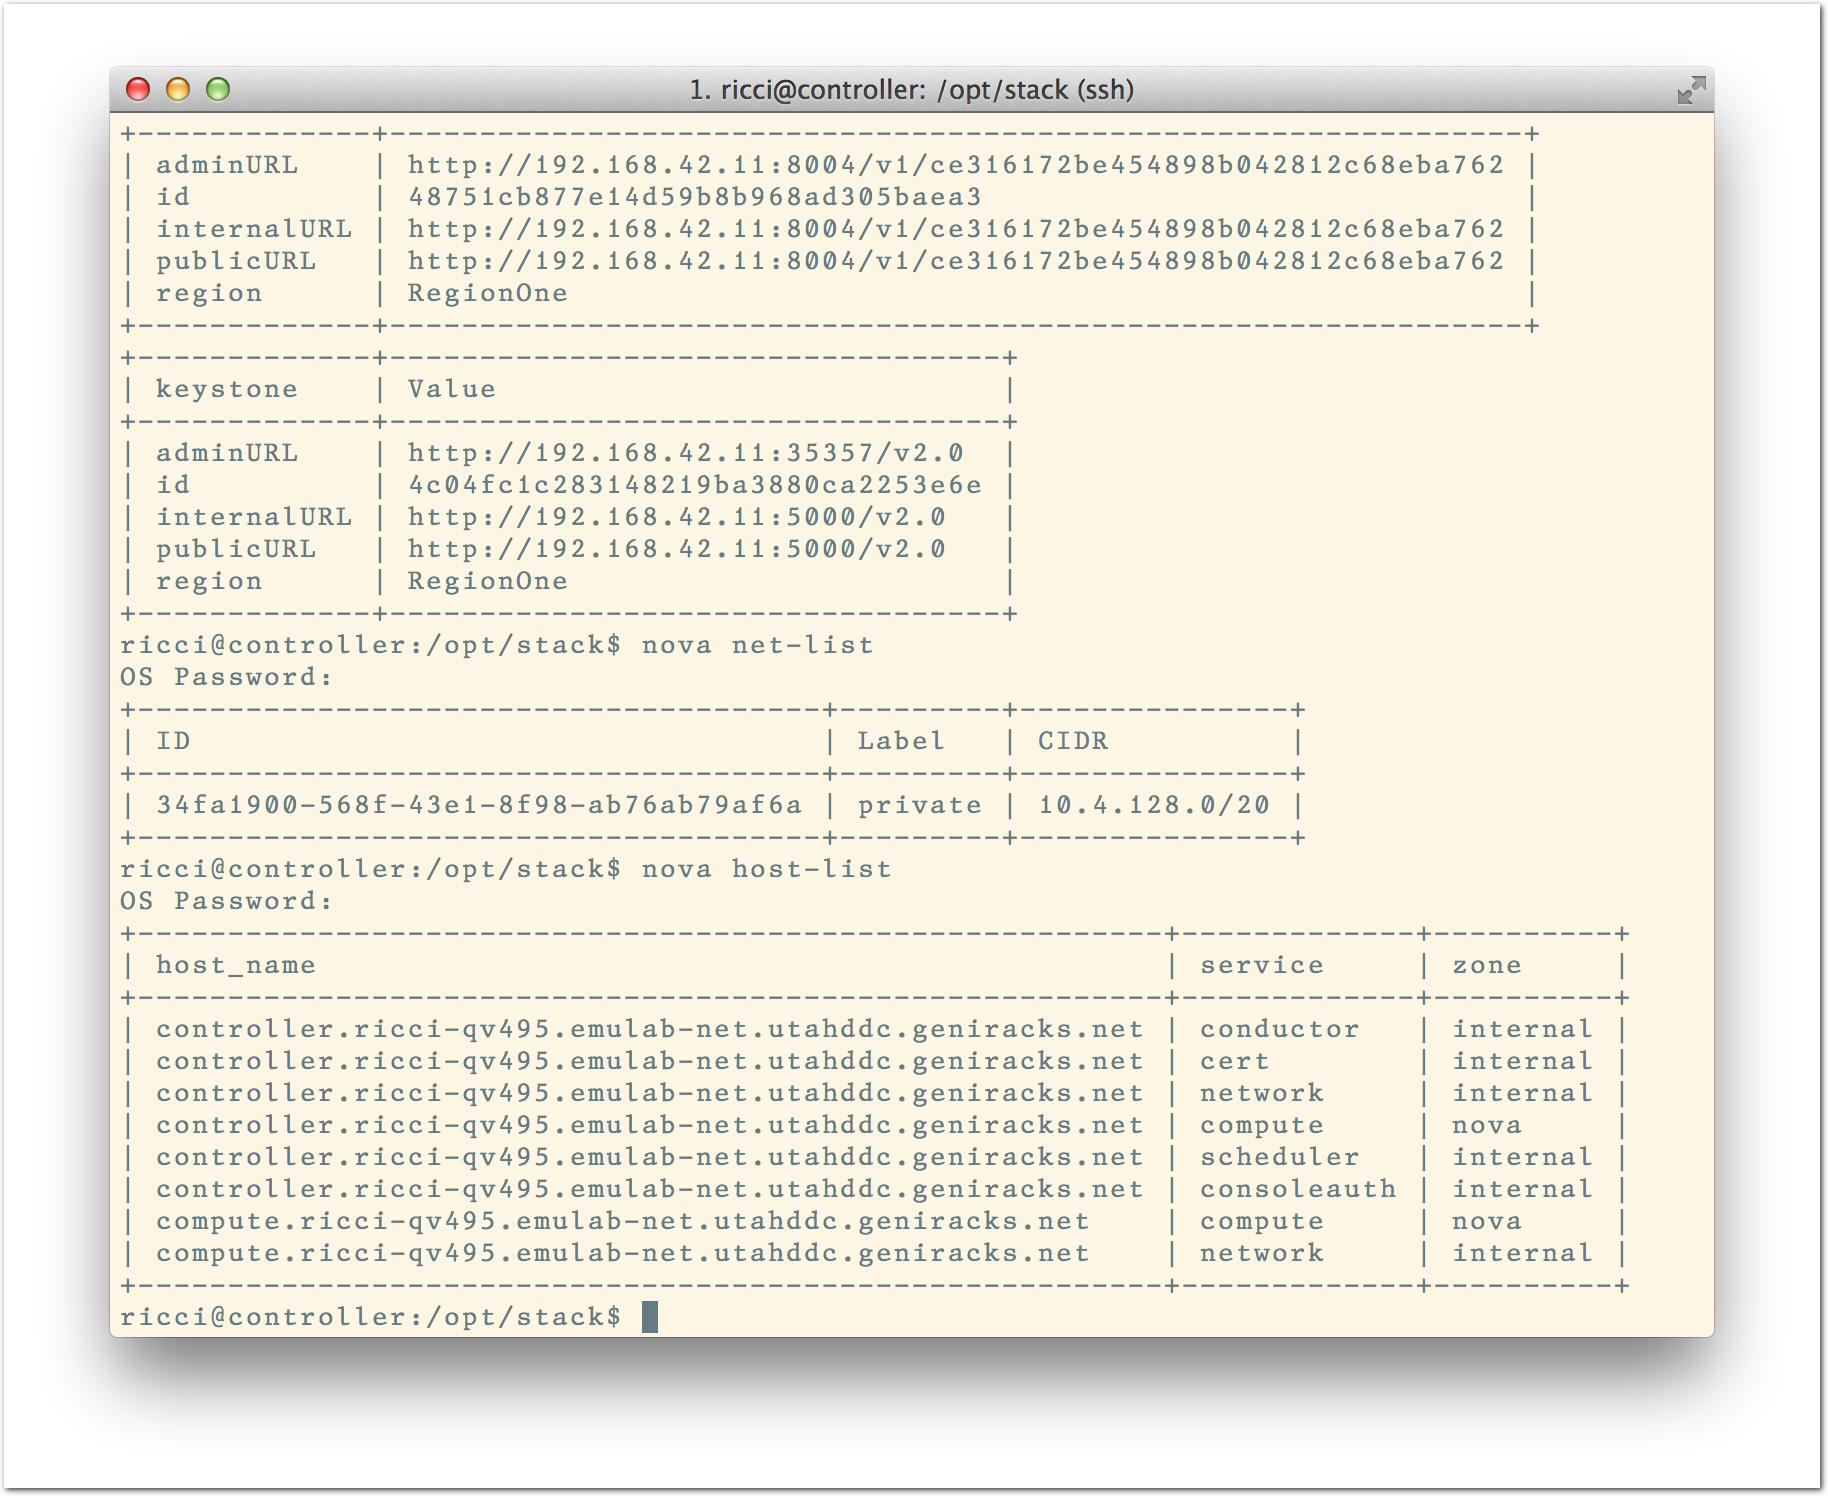 screenshots/apt/openstack-shell.png